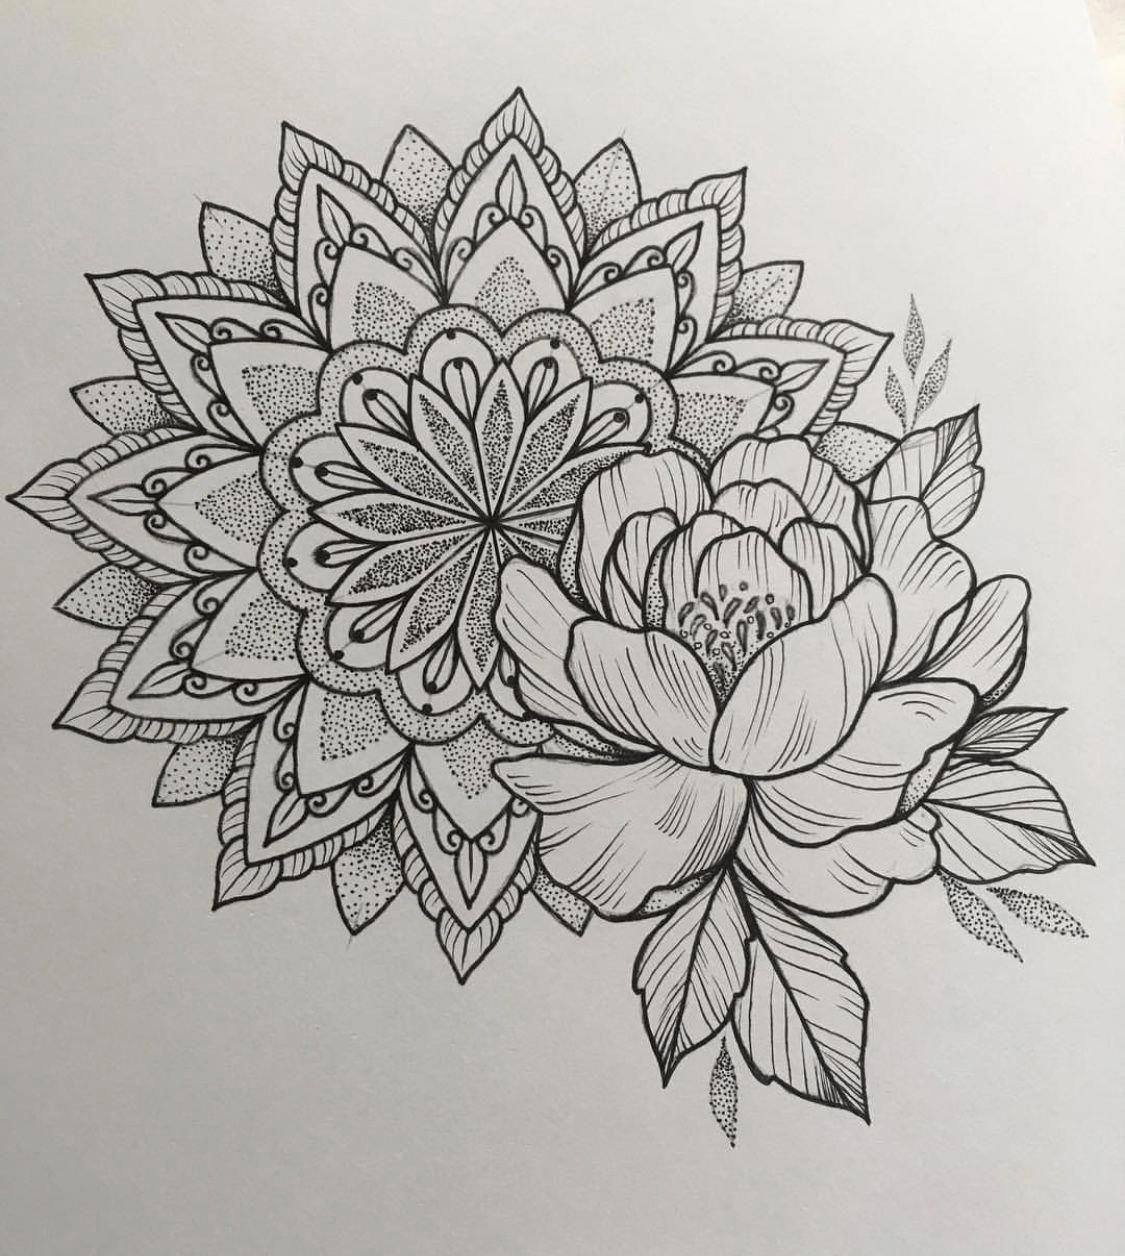 Mandalatattoo Wildflowertattoos Mandala Tattoo Shoulder Mandala Tattoo Sleeve Traditional Mandala Tattoo